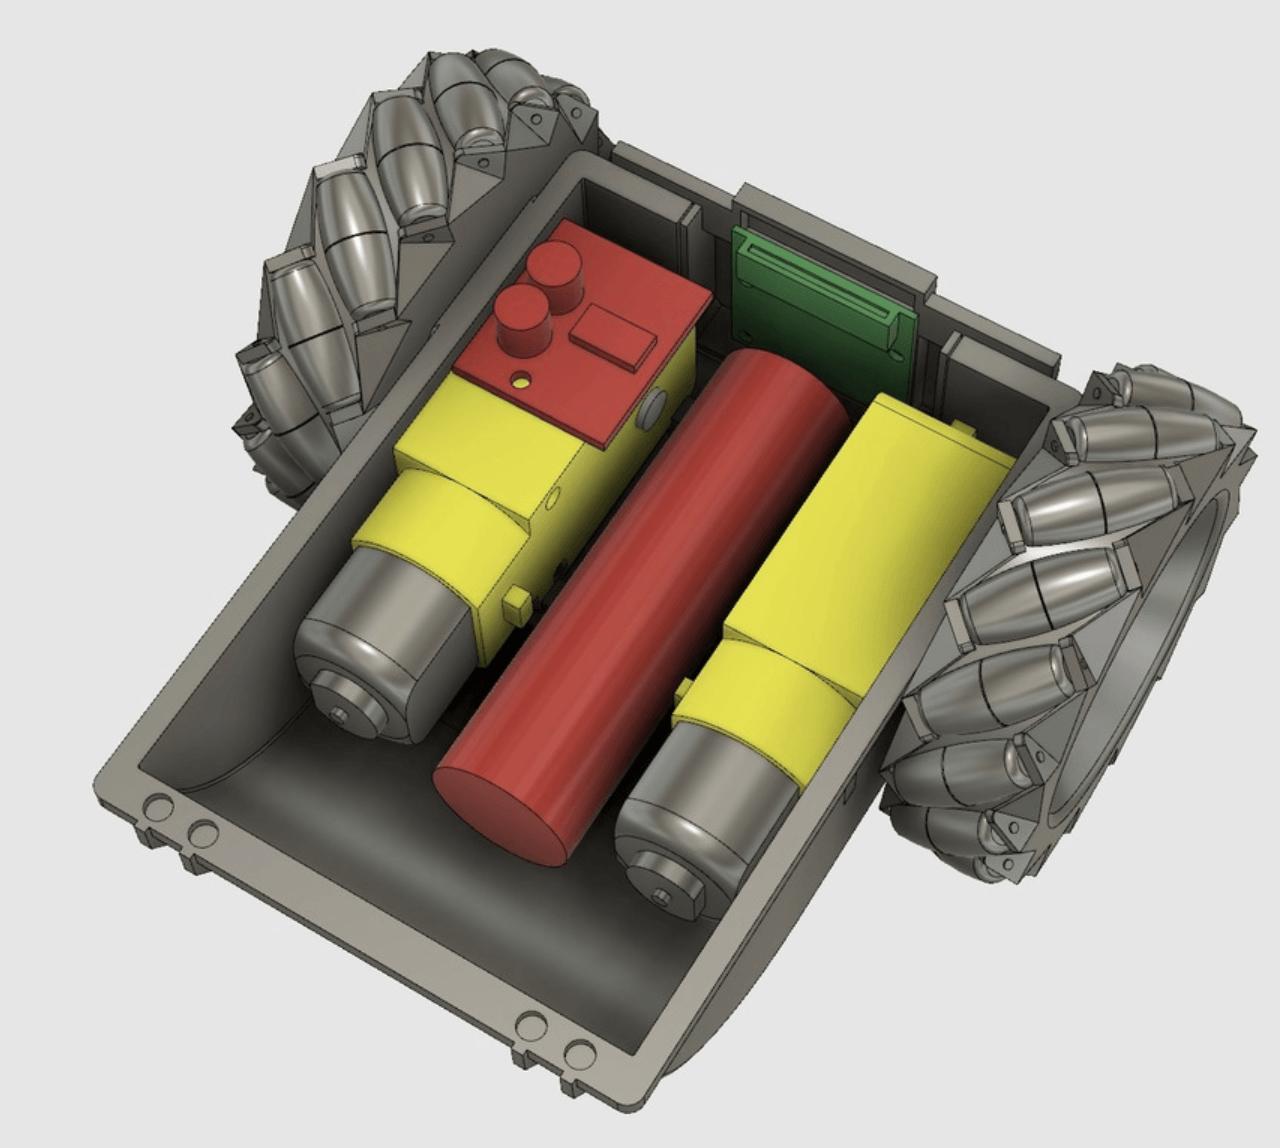 Capture d'écran 2018-04-25 à 09.48.27.png Download free STL file Twitch Drone Chassis for ZeroBot • 3D printable template, MaxMKA